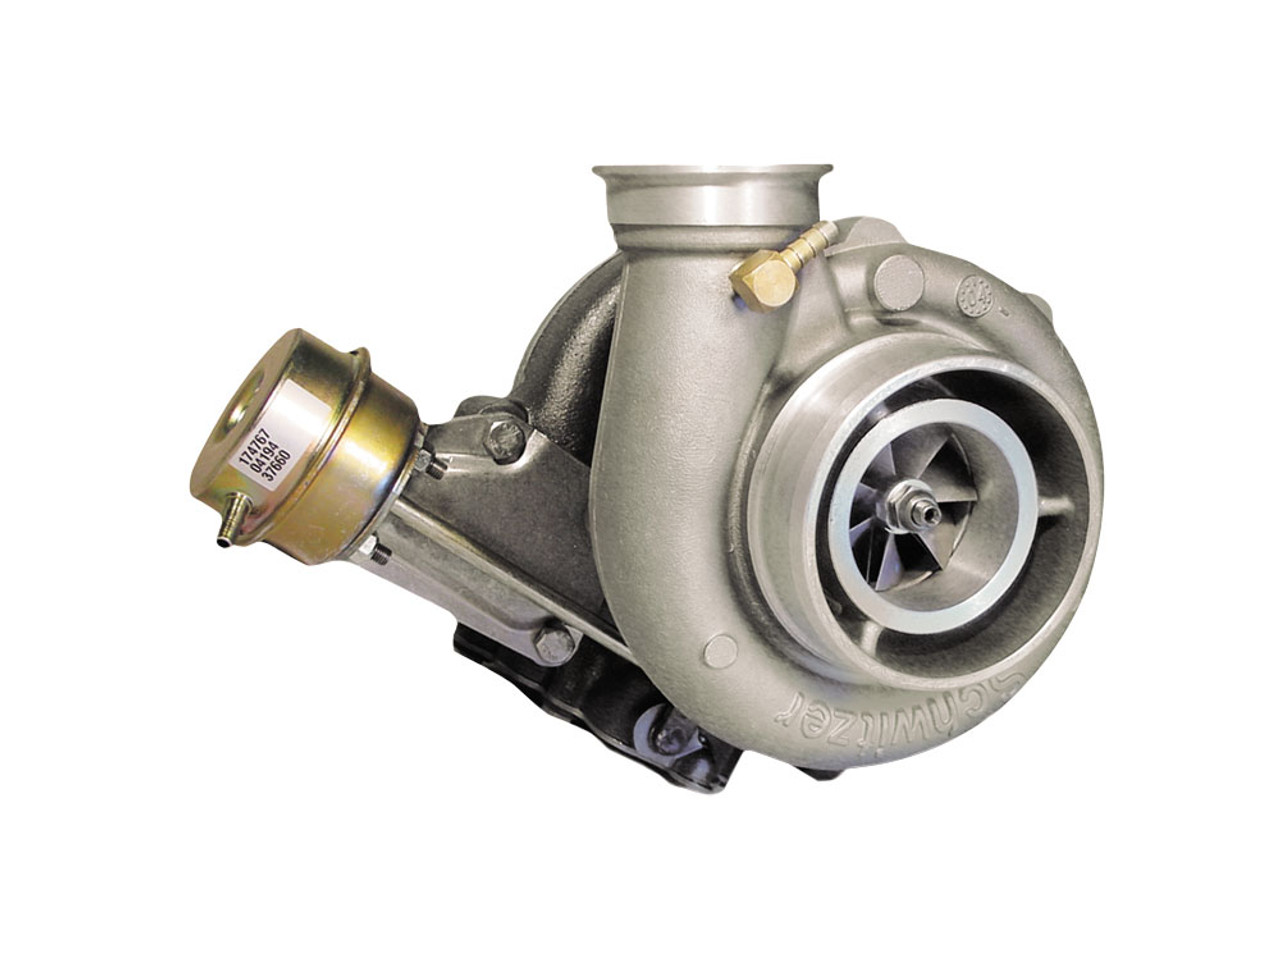 Borg Warner 57-65-14 S300GX Turbo Upgrade for 2nd Gen Cummins 174430